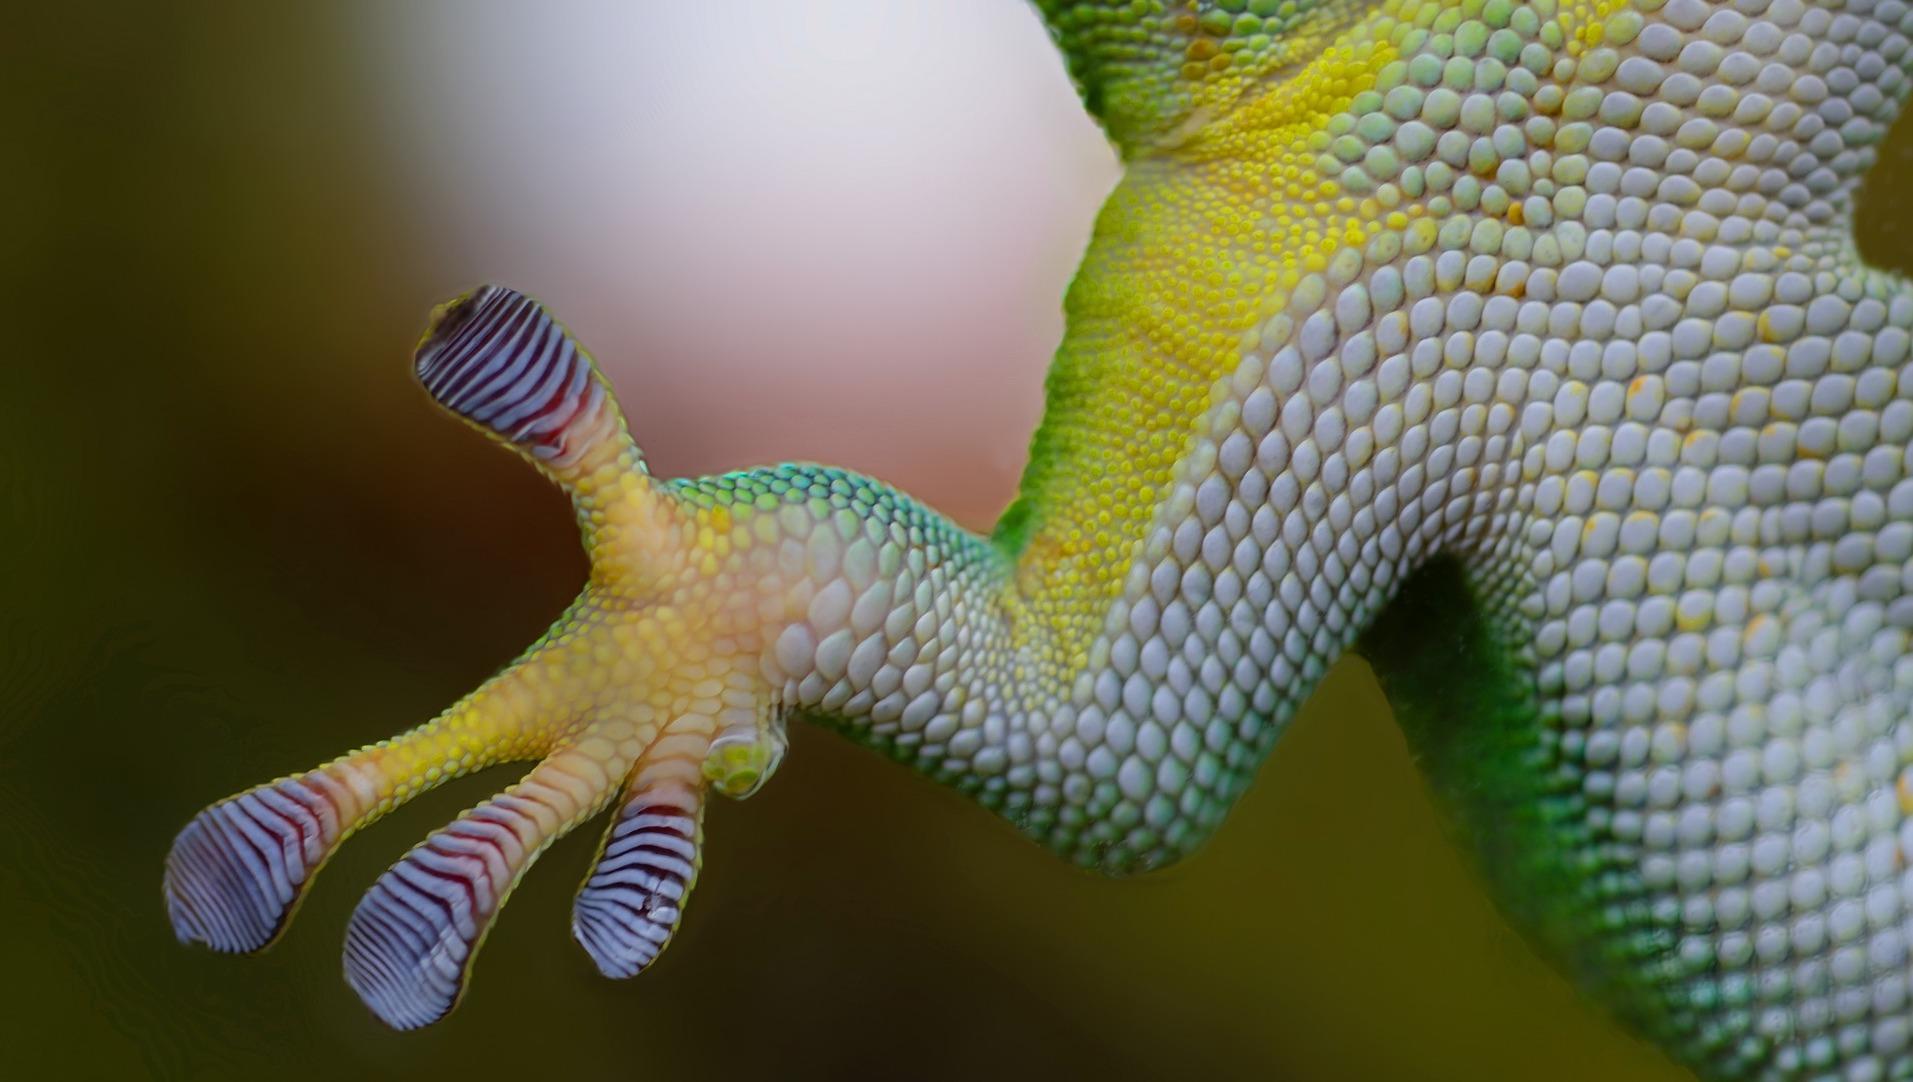 gecko-800887_1920pixabay crop